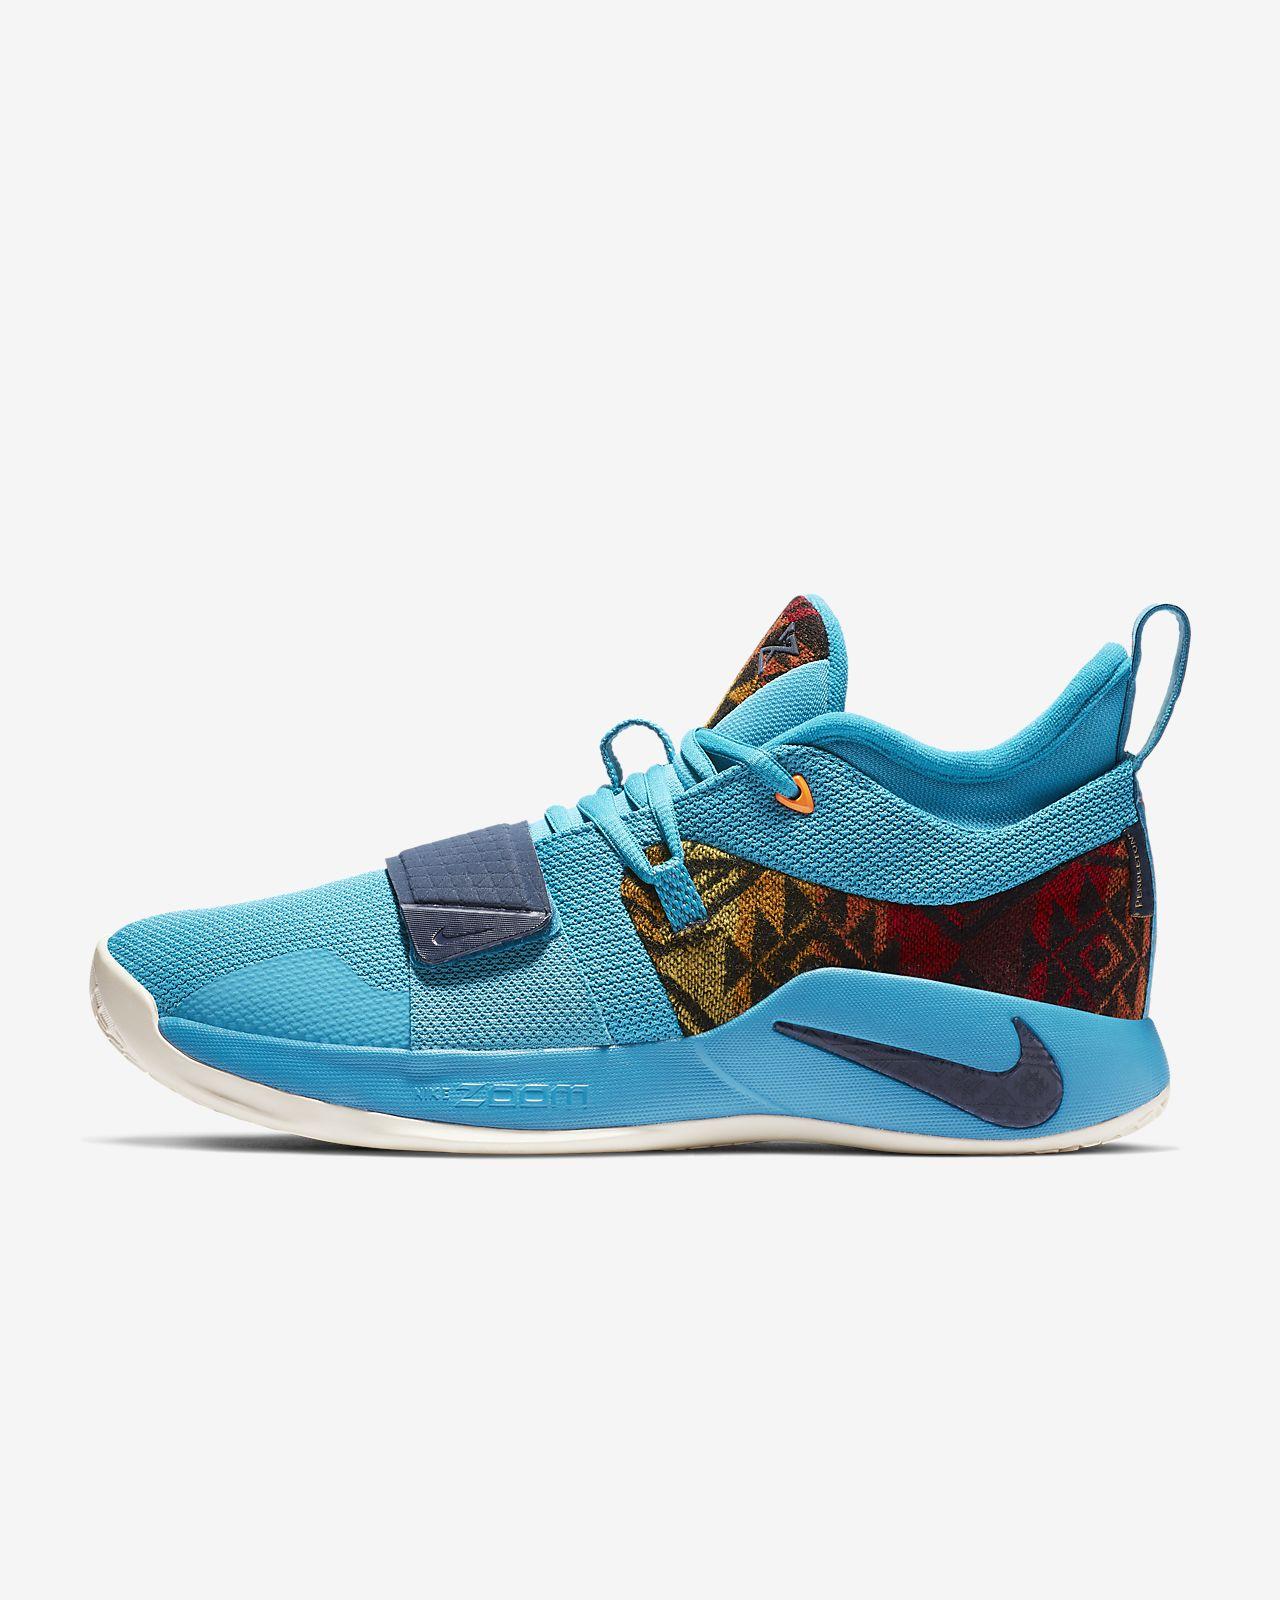 PG 2.5 Pendleton Shoe